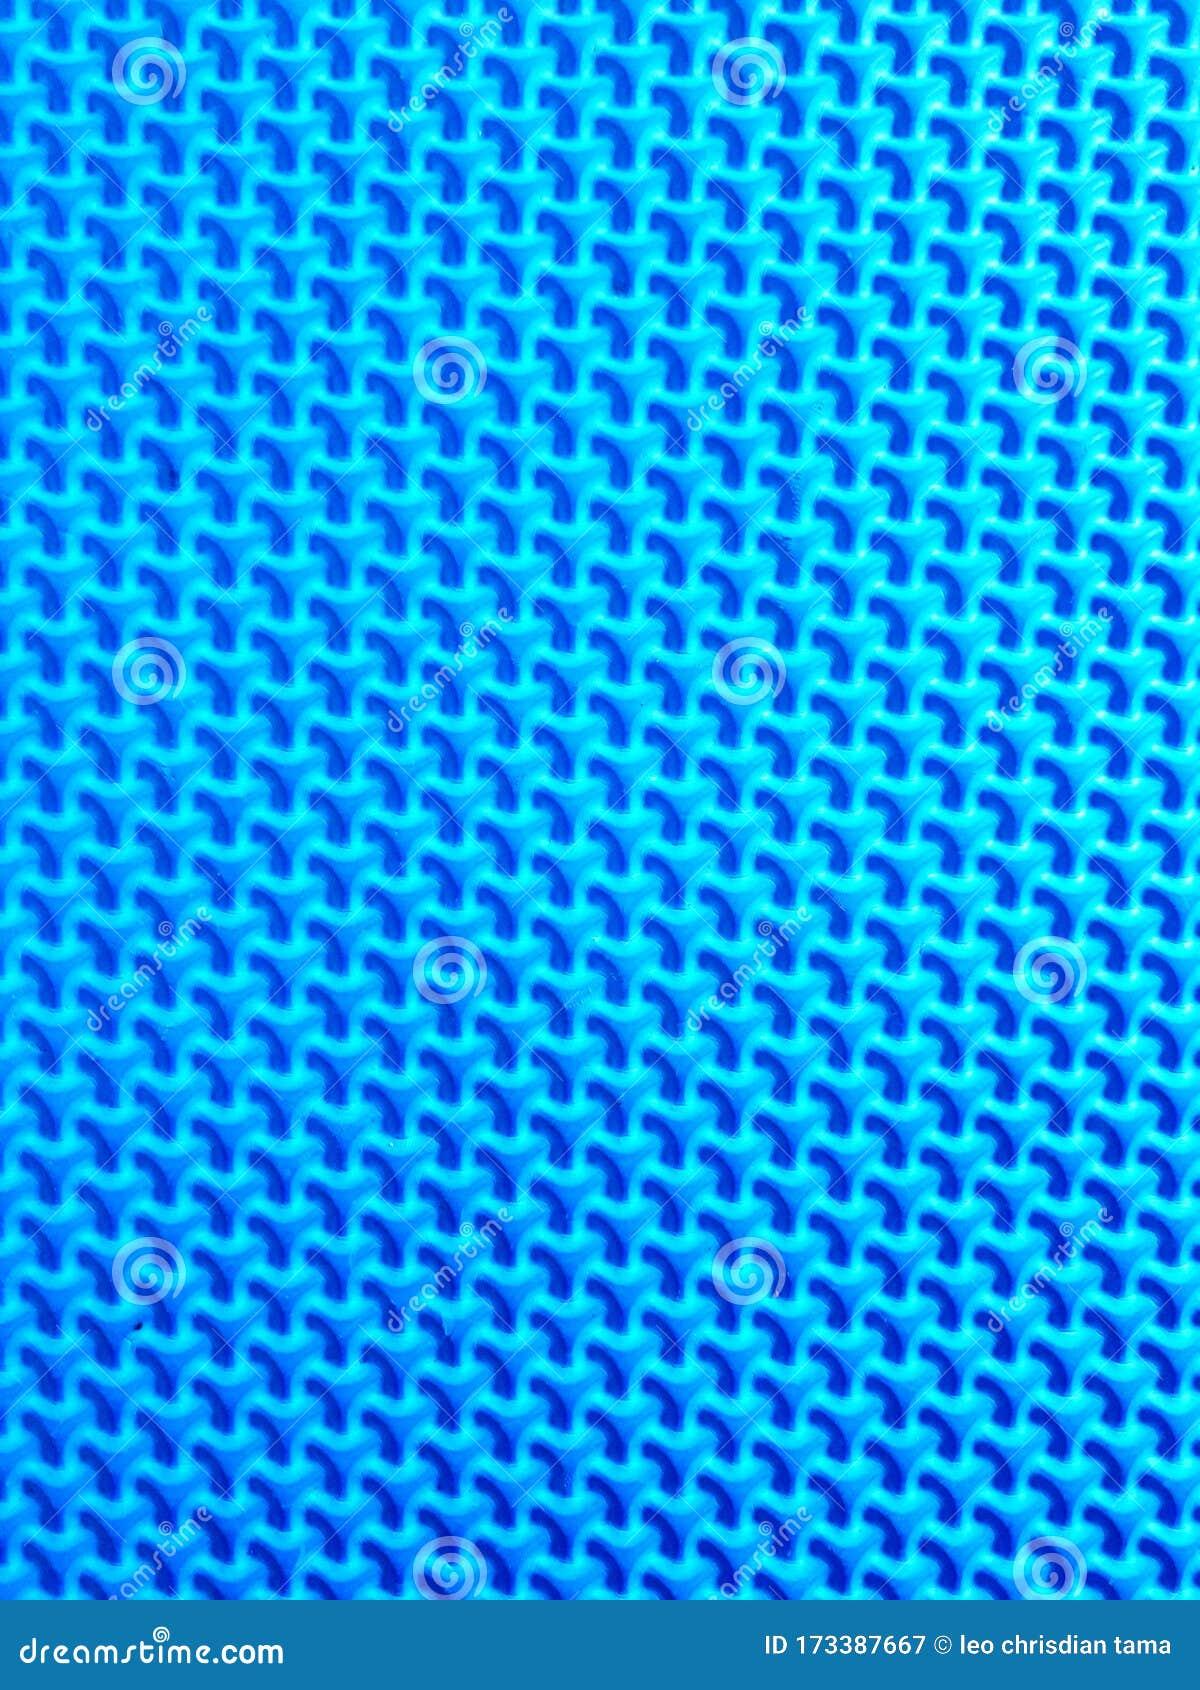 Blue Amazing Pattern Background Stock Image Image Of Mystery Backgrounds 173387667